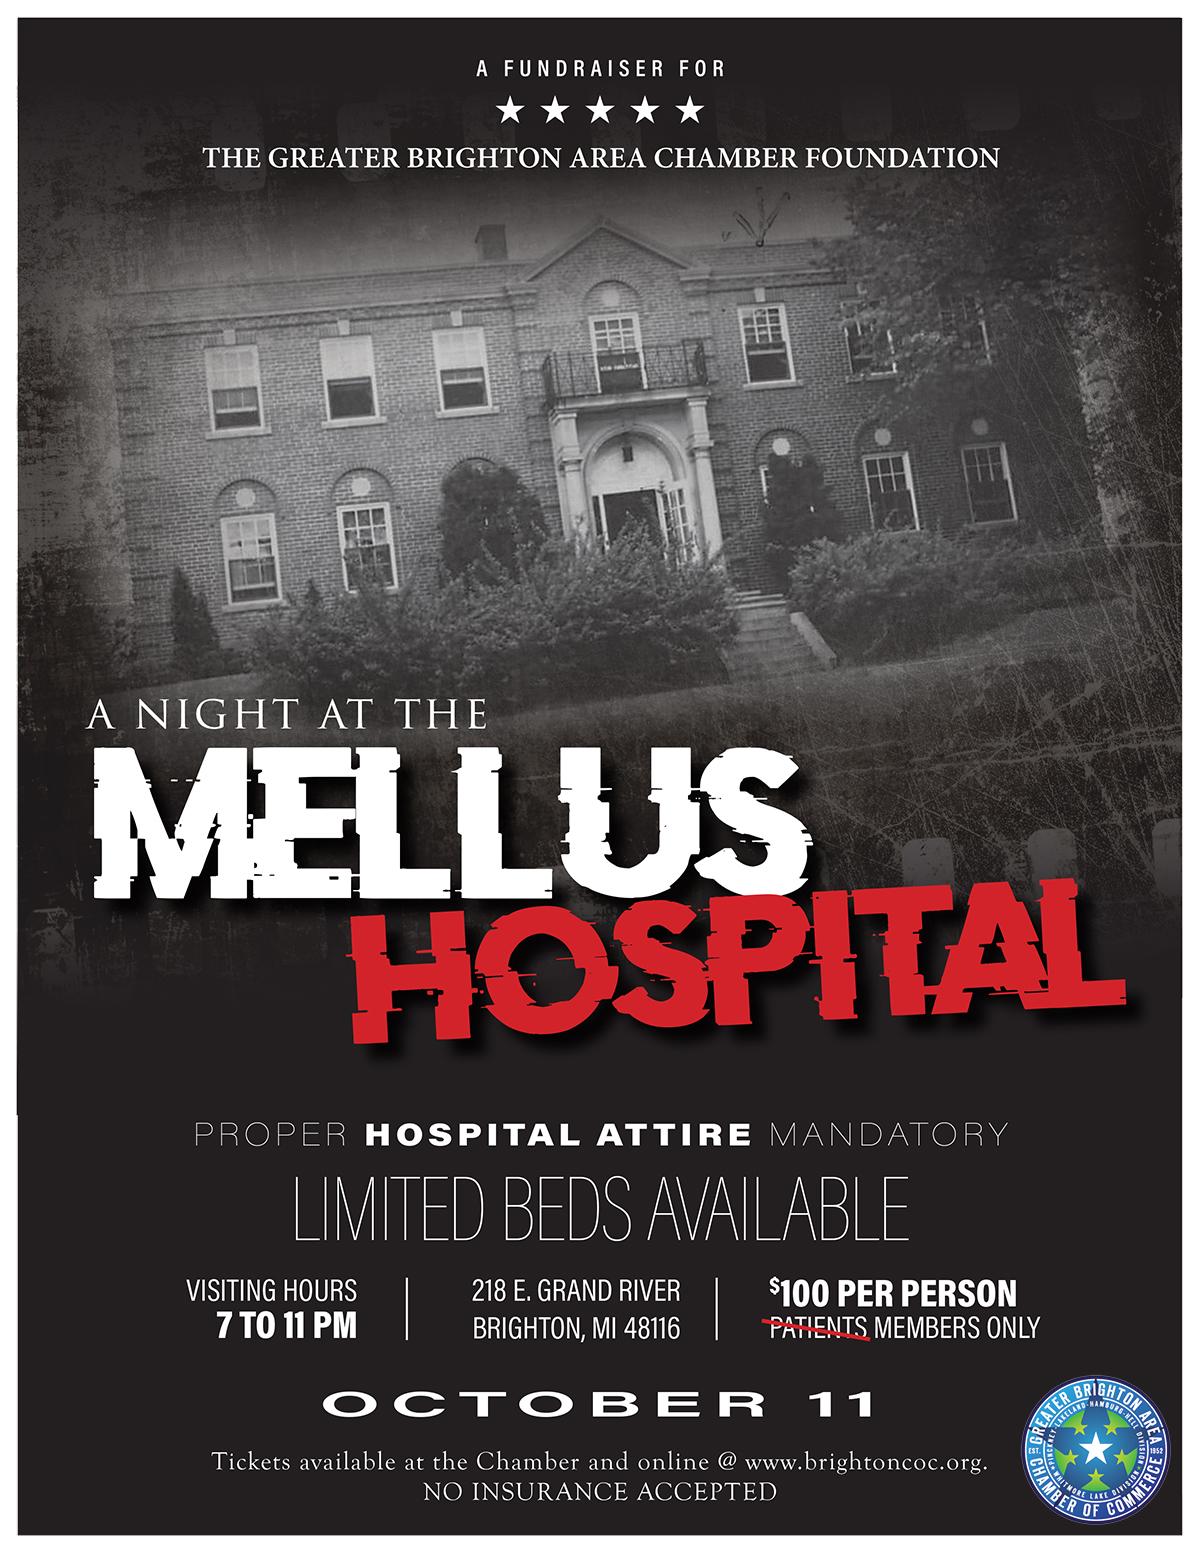 Night at the Mellus Hospital Fundraiser 2019